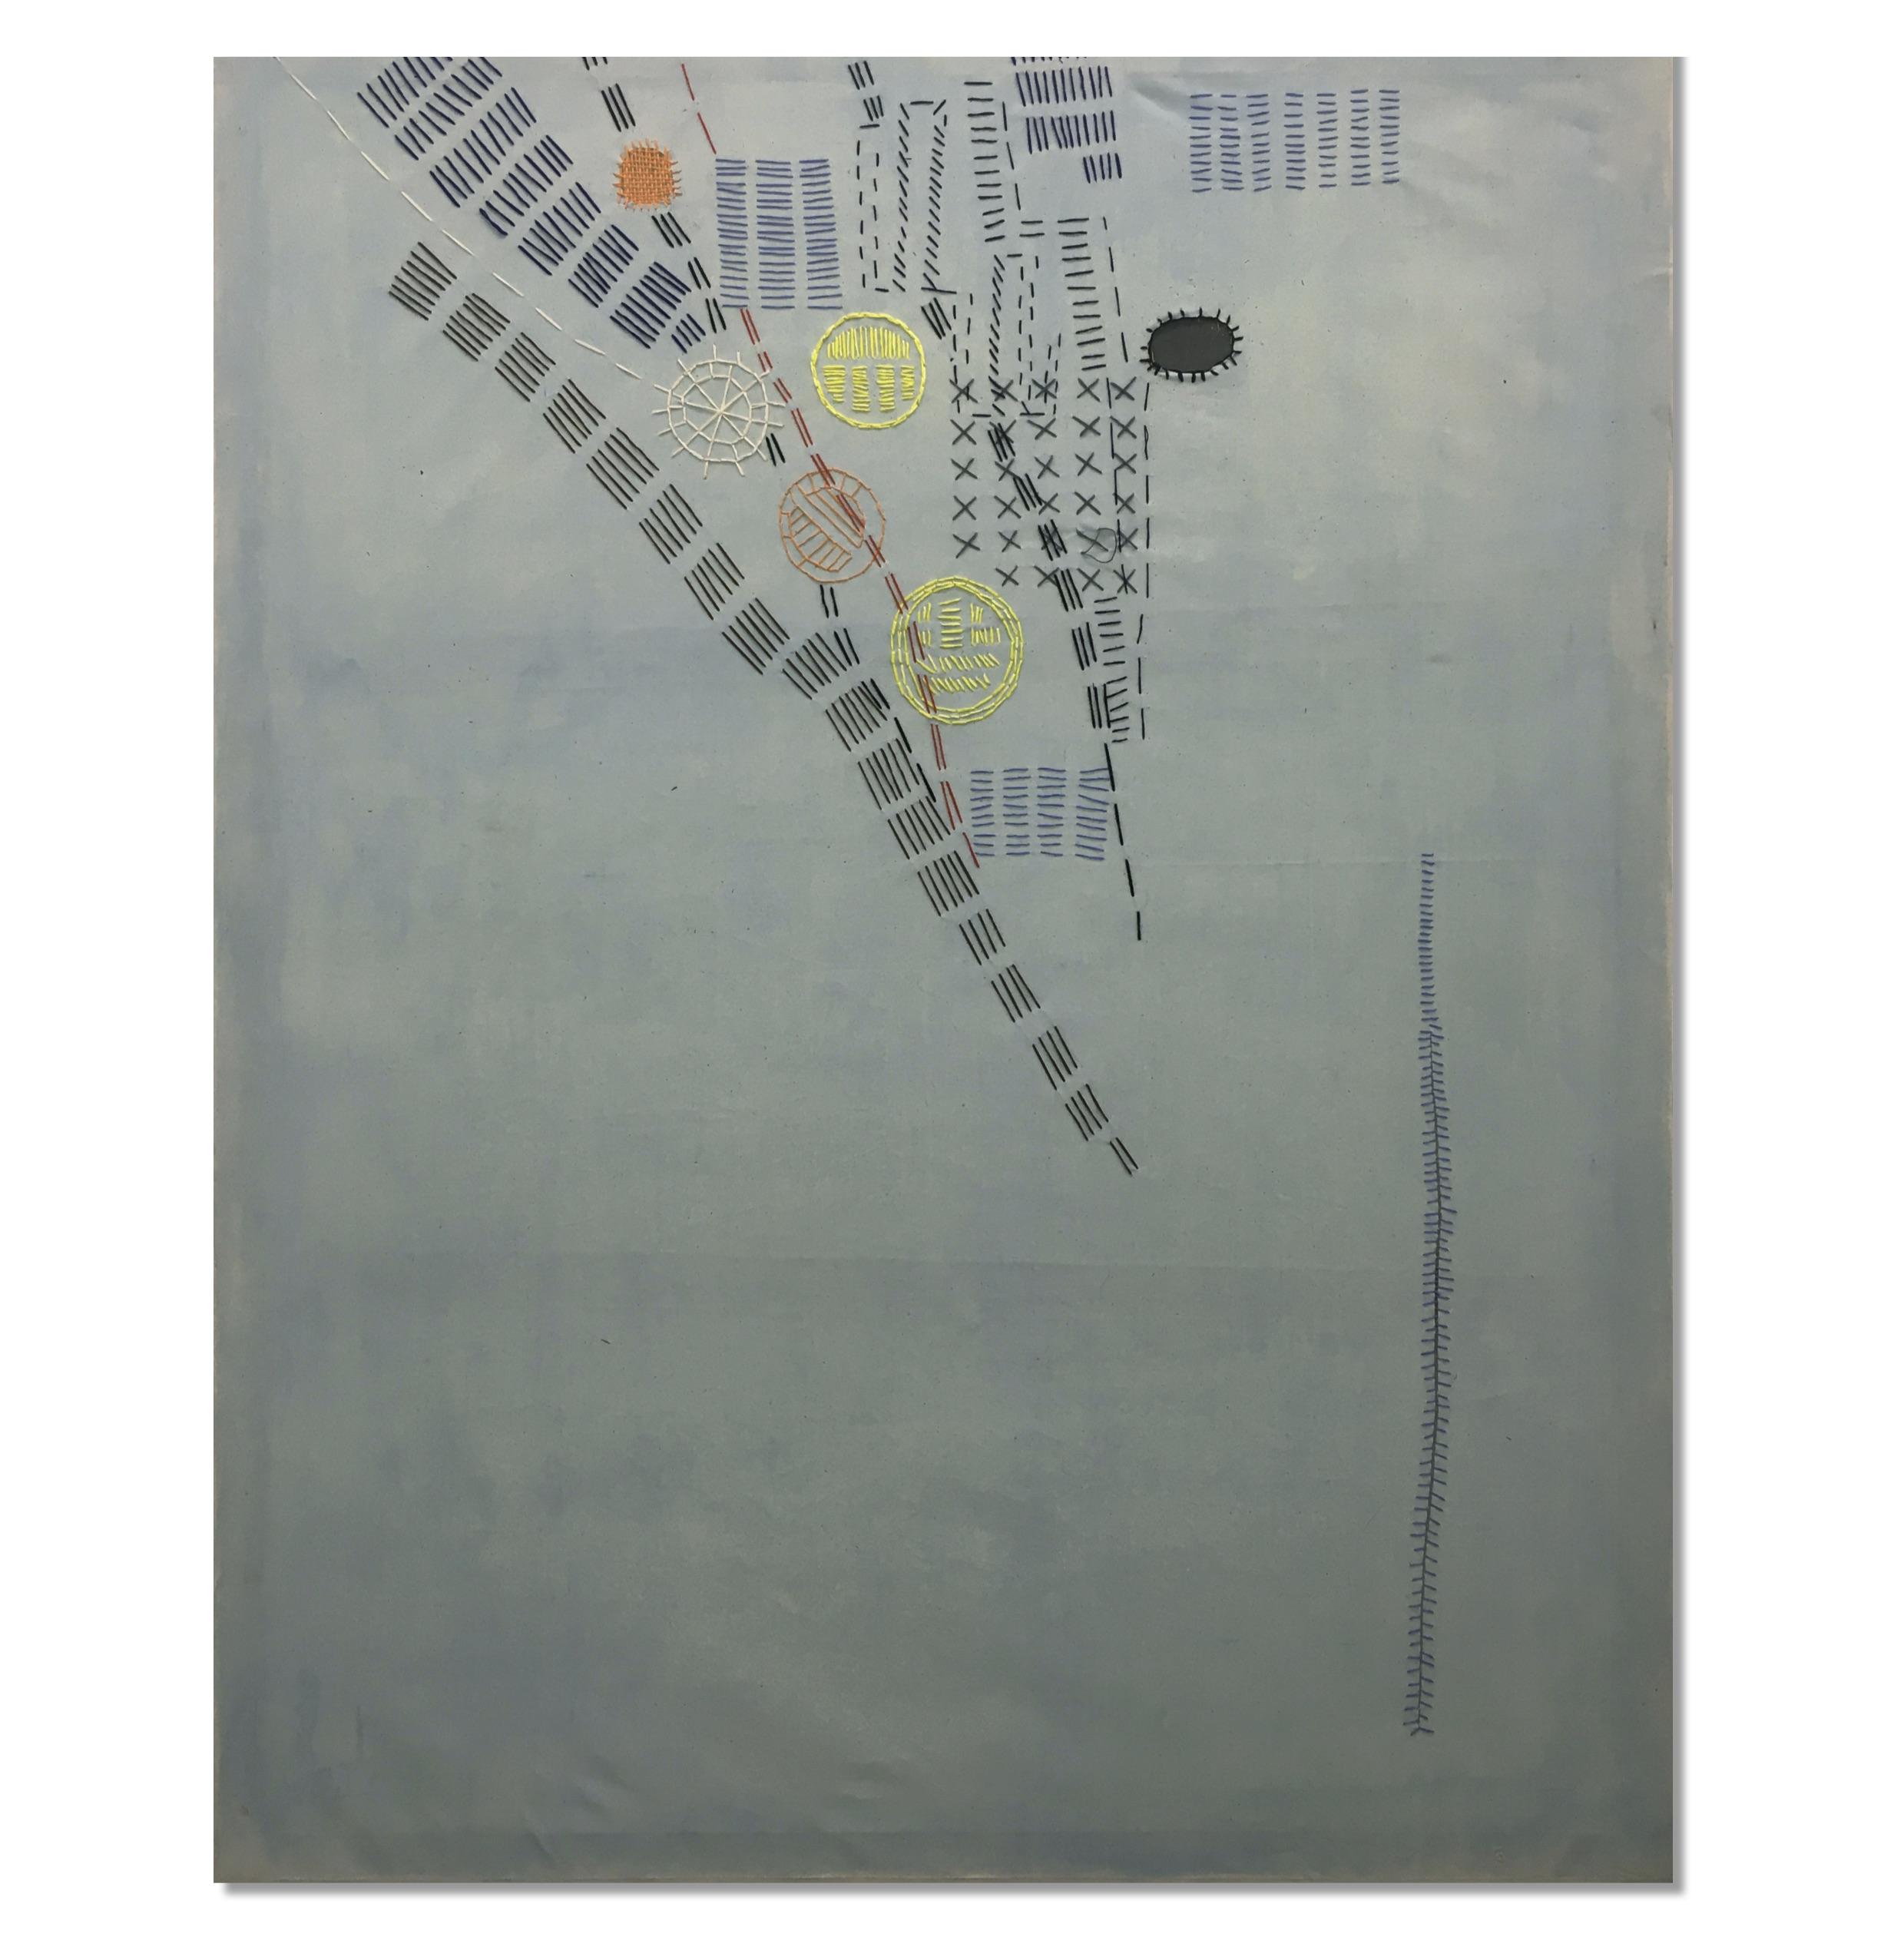 Teresa Lanceta - Con idolatrable apego. 1996. Tejido cosido y pintado. 146 x 114 cm.